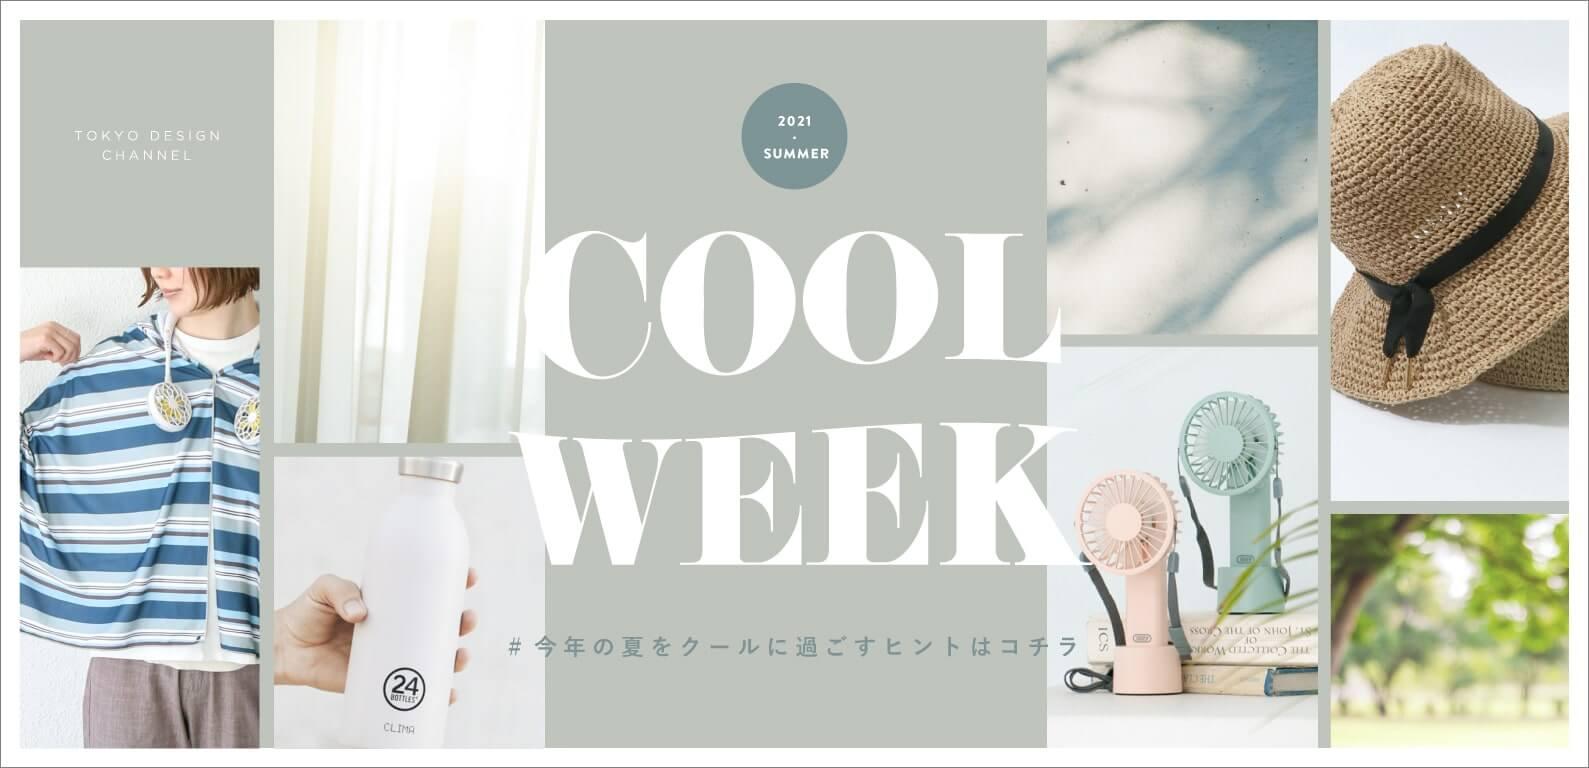 TDC COOL WEEK